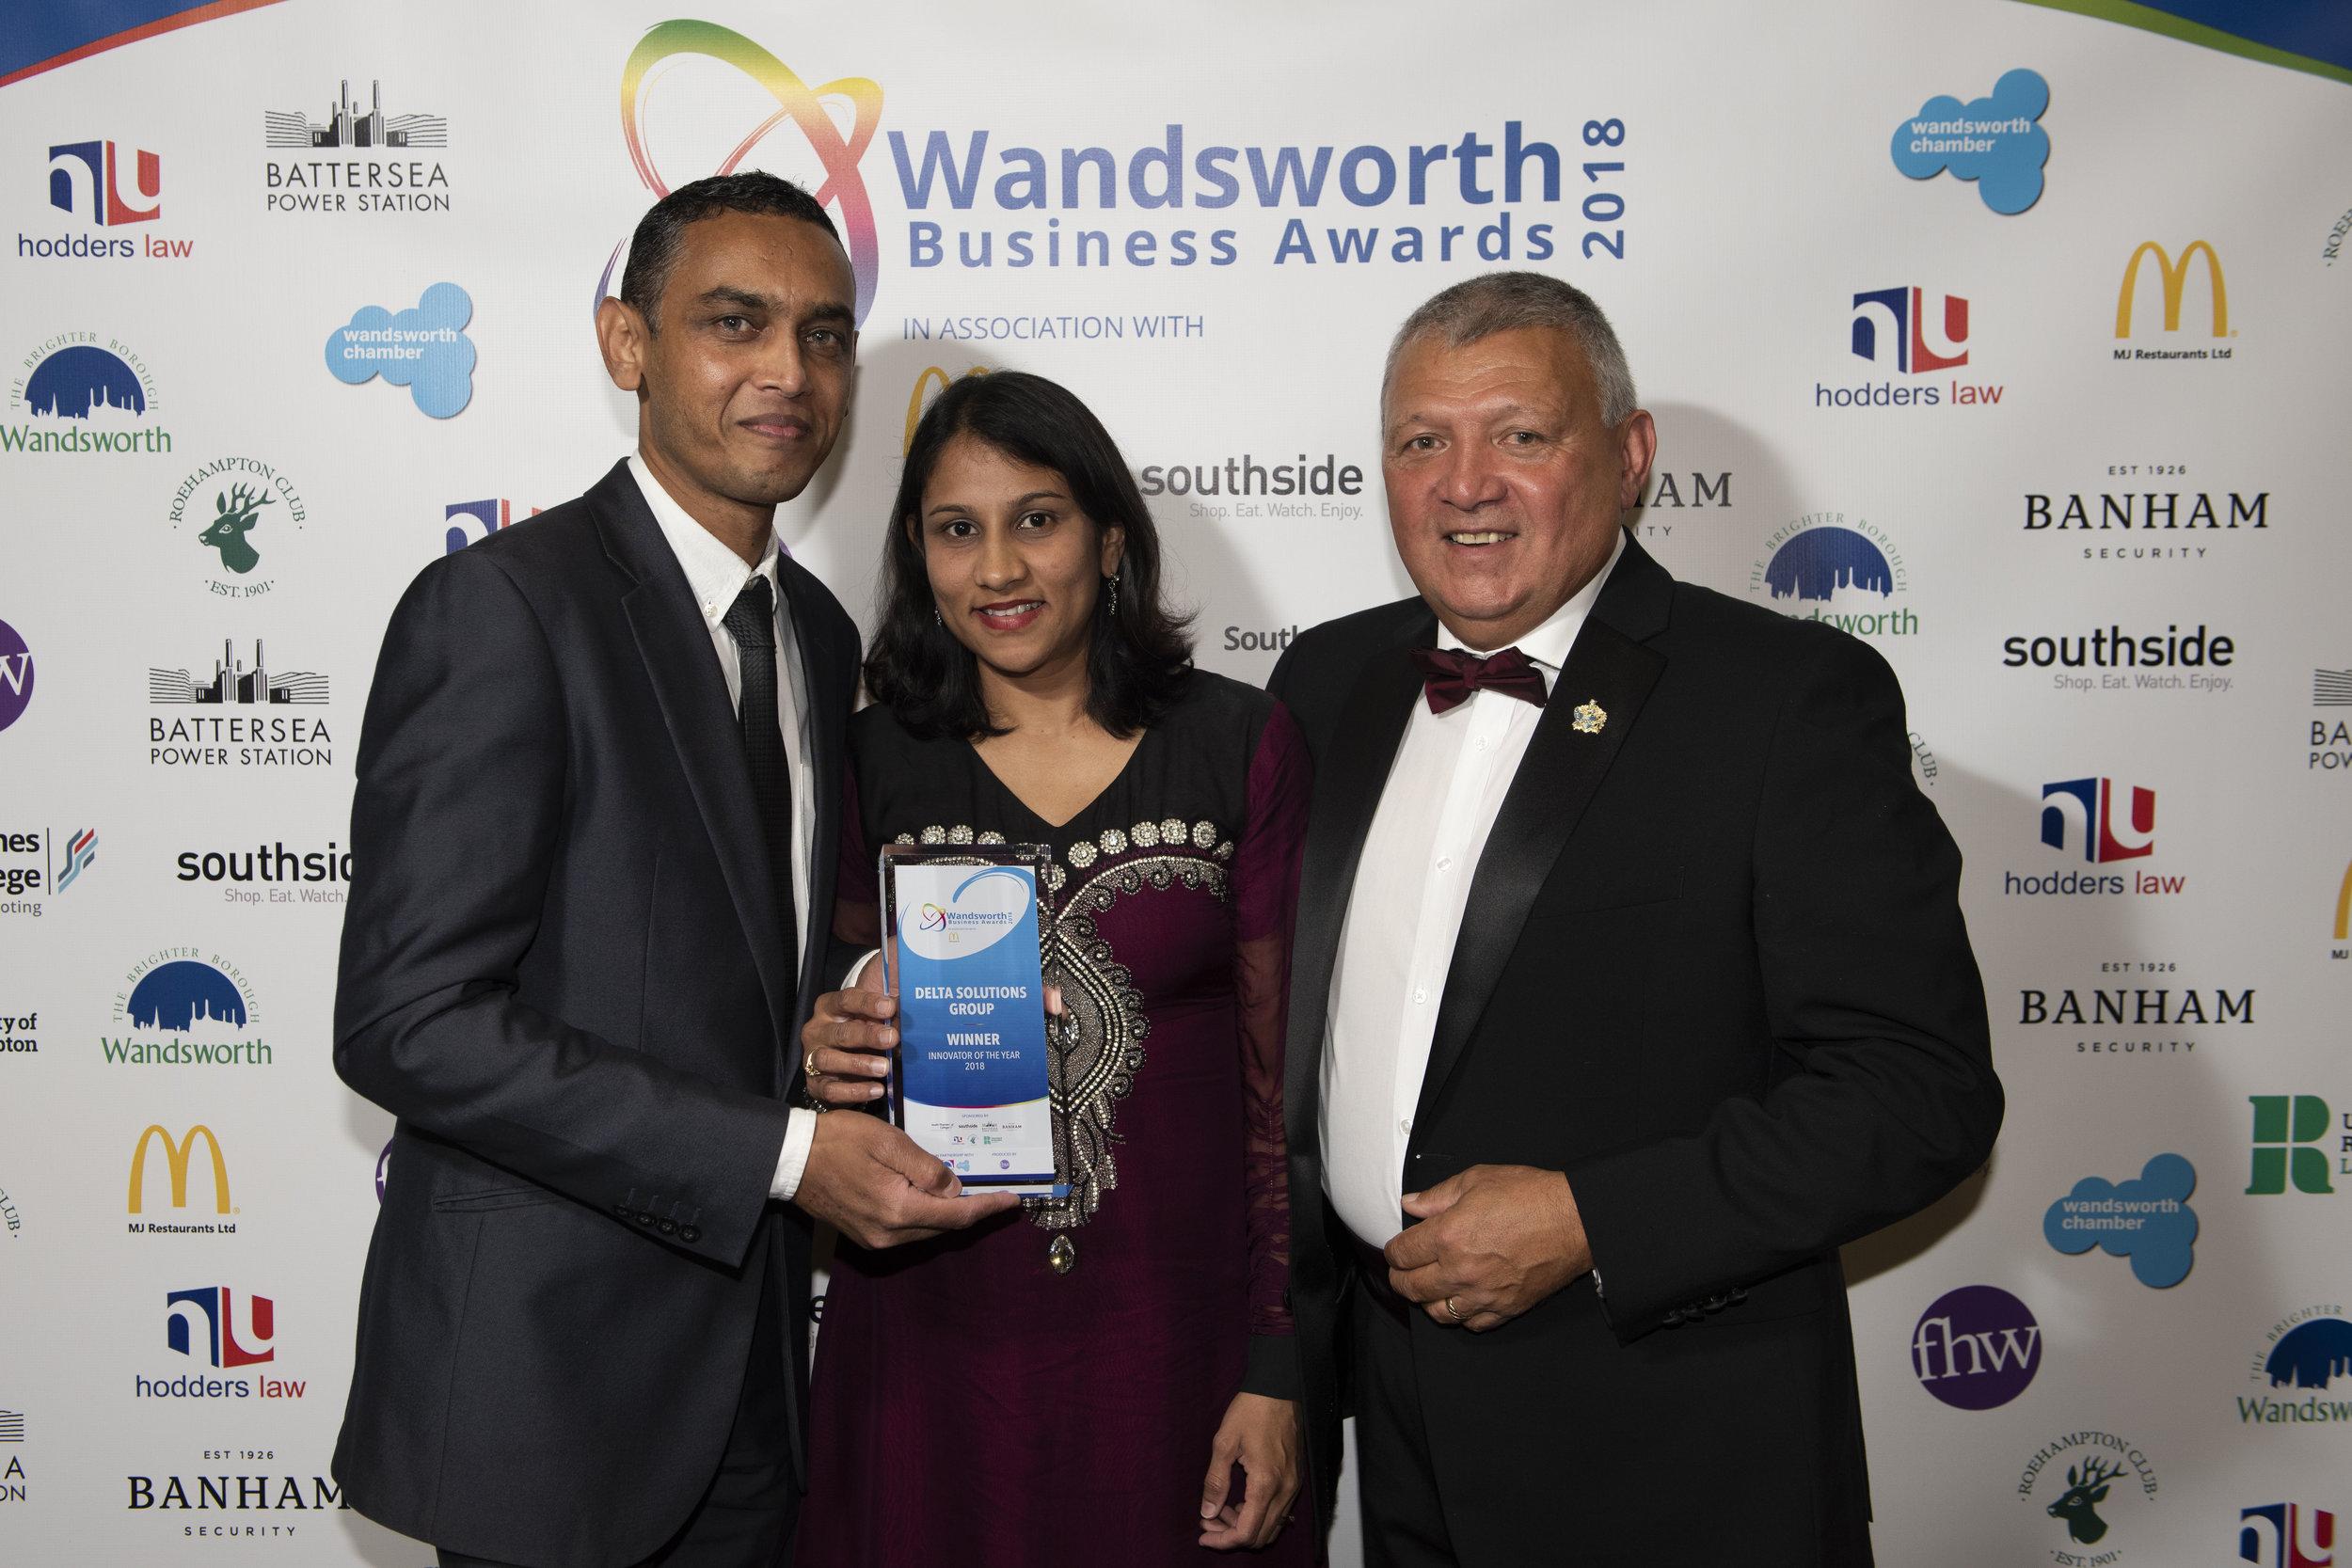 WANDSWORTH-WINNERS-2018_010 innovator.jpg